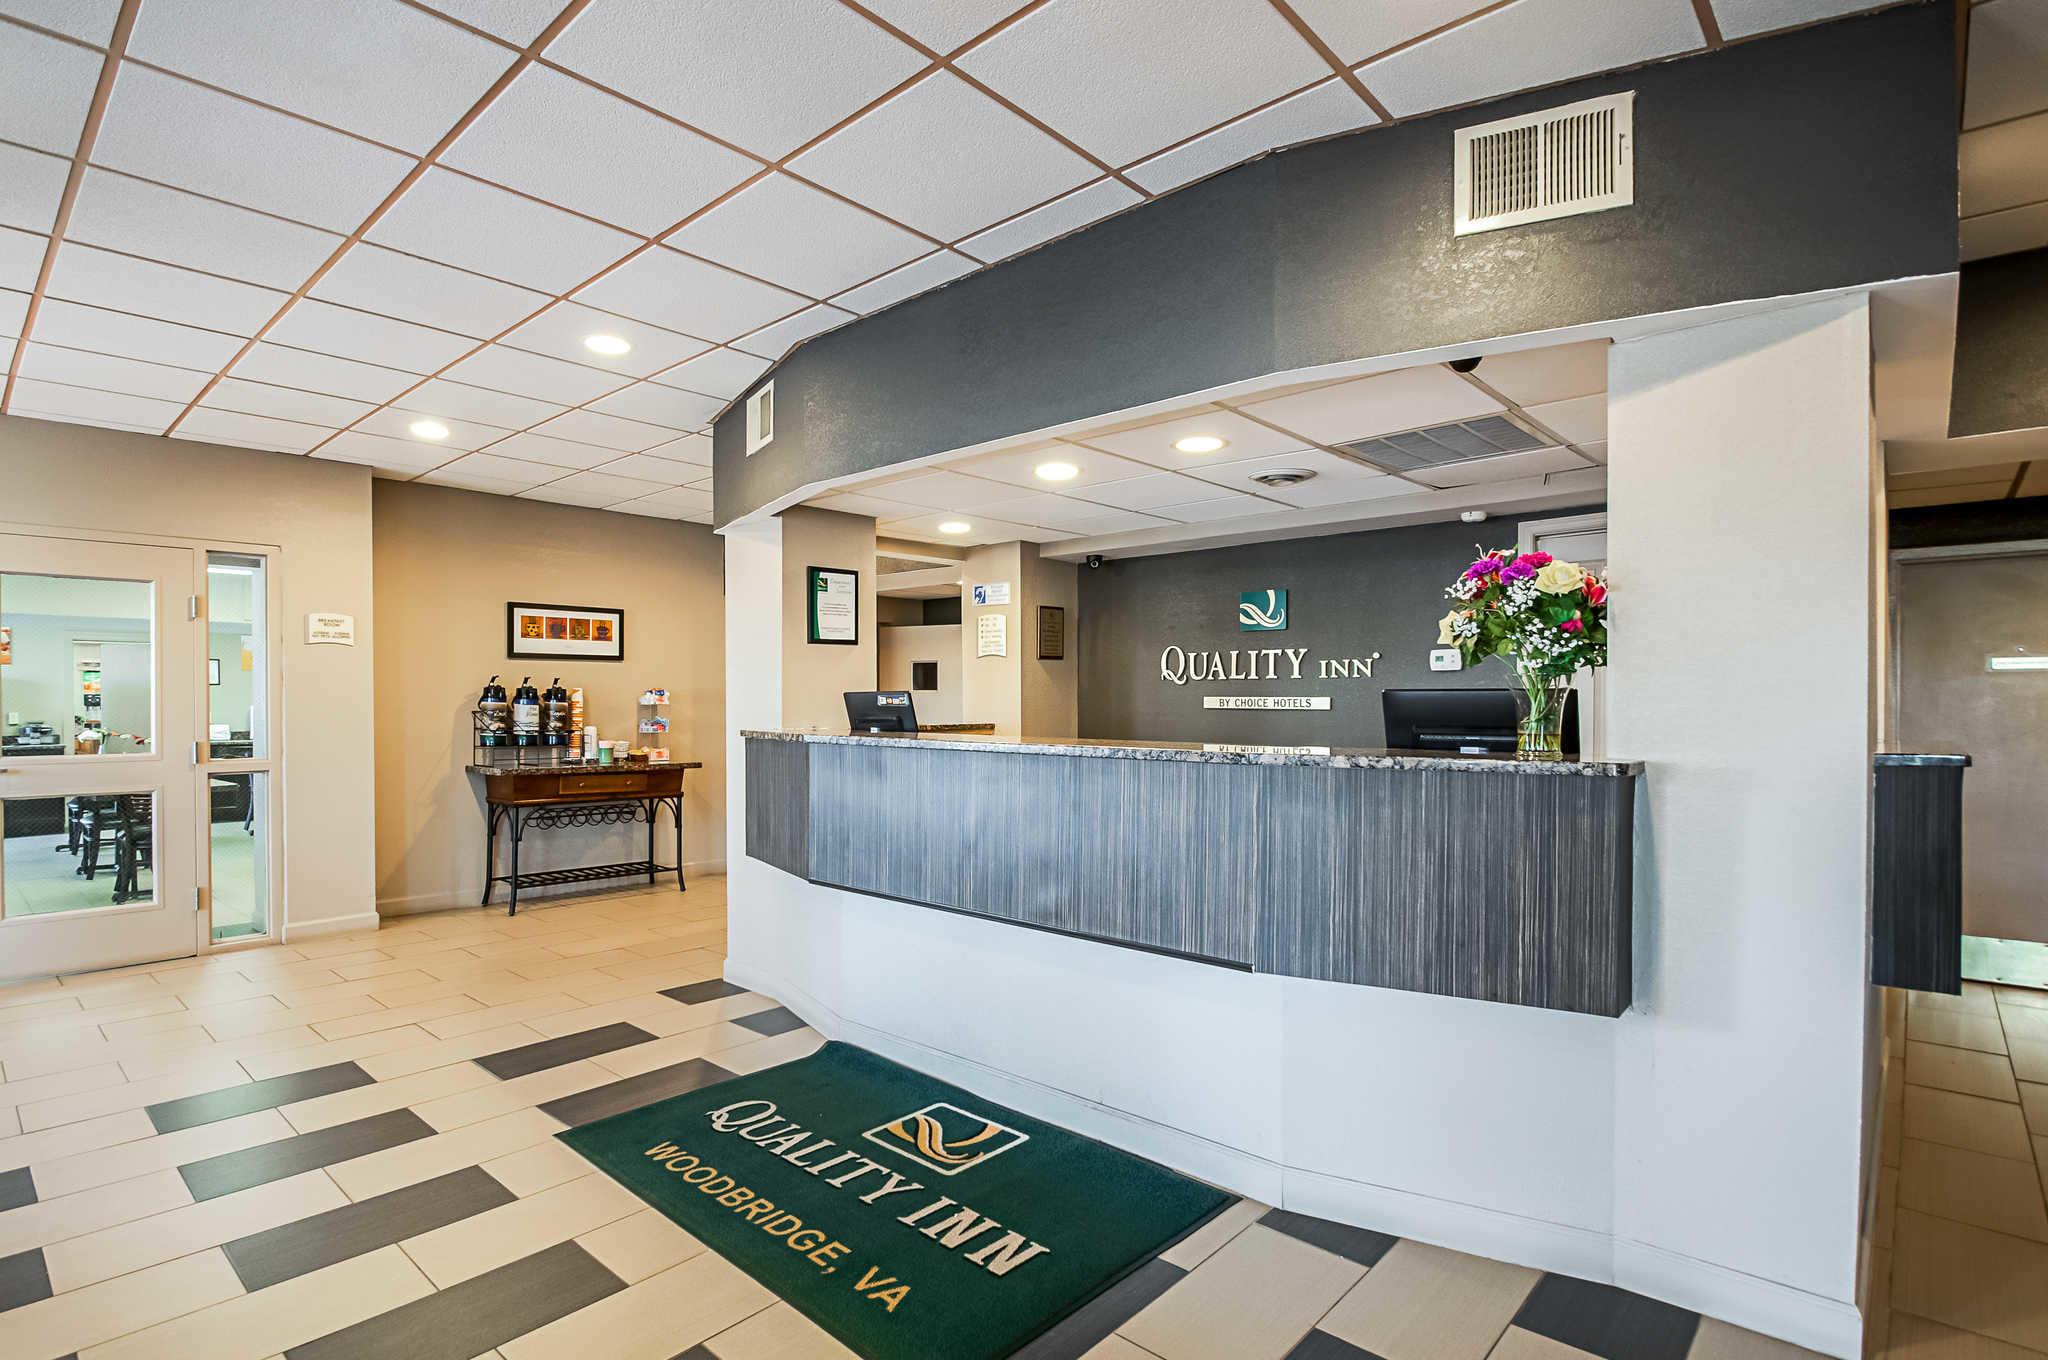 Quality Inn near Potomac Mills image 1